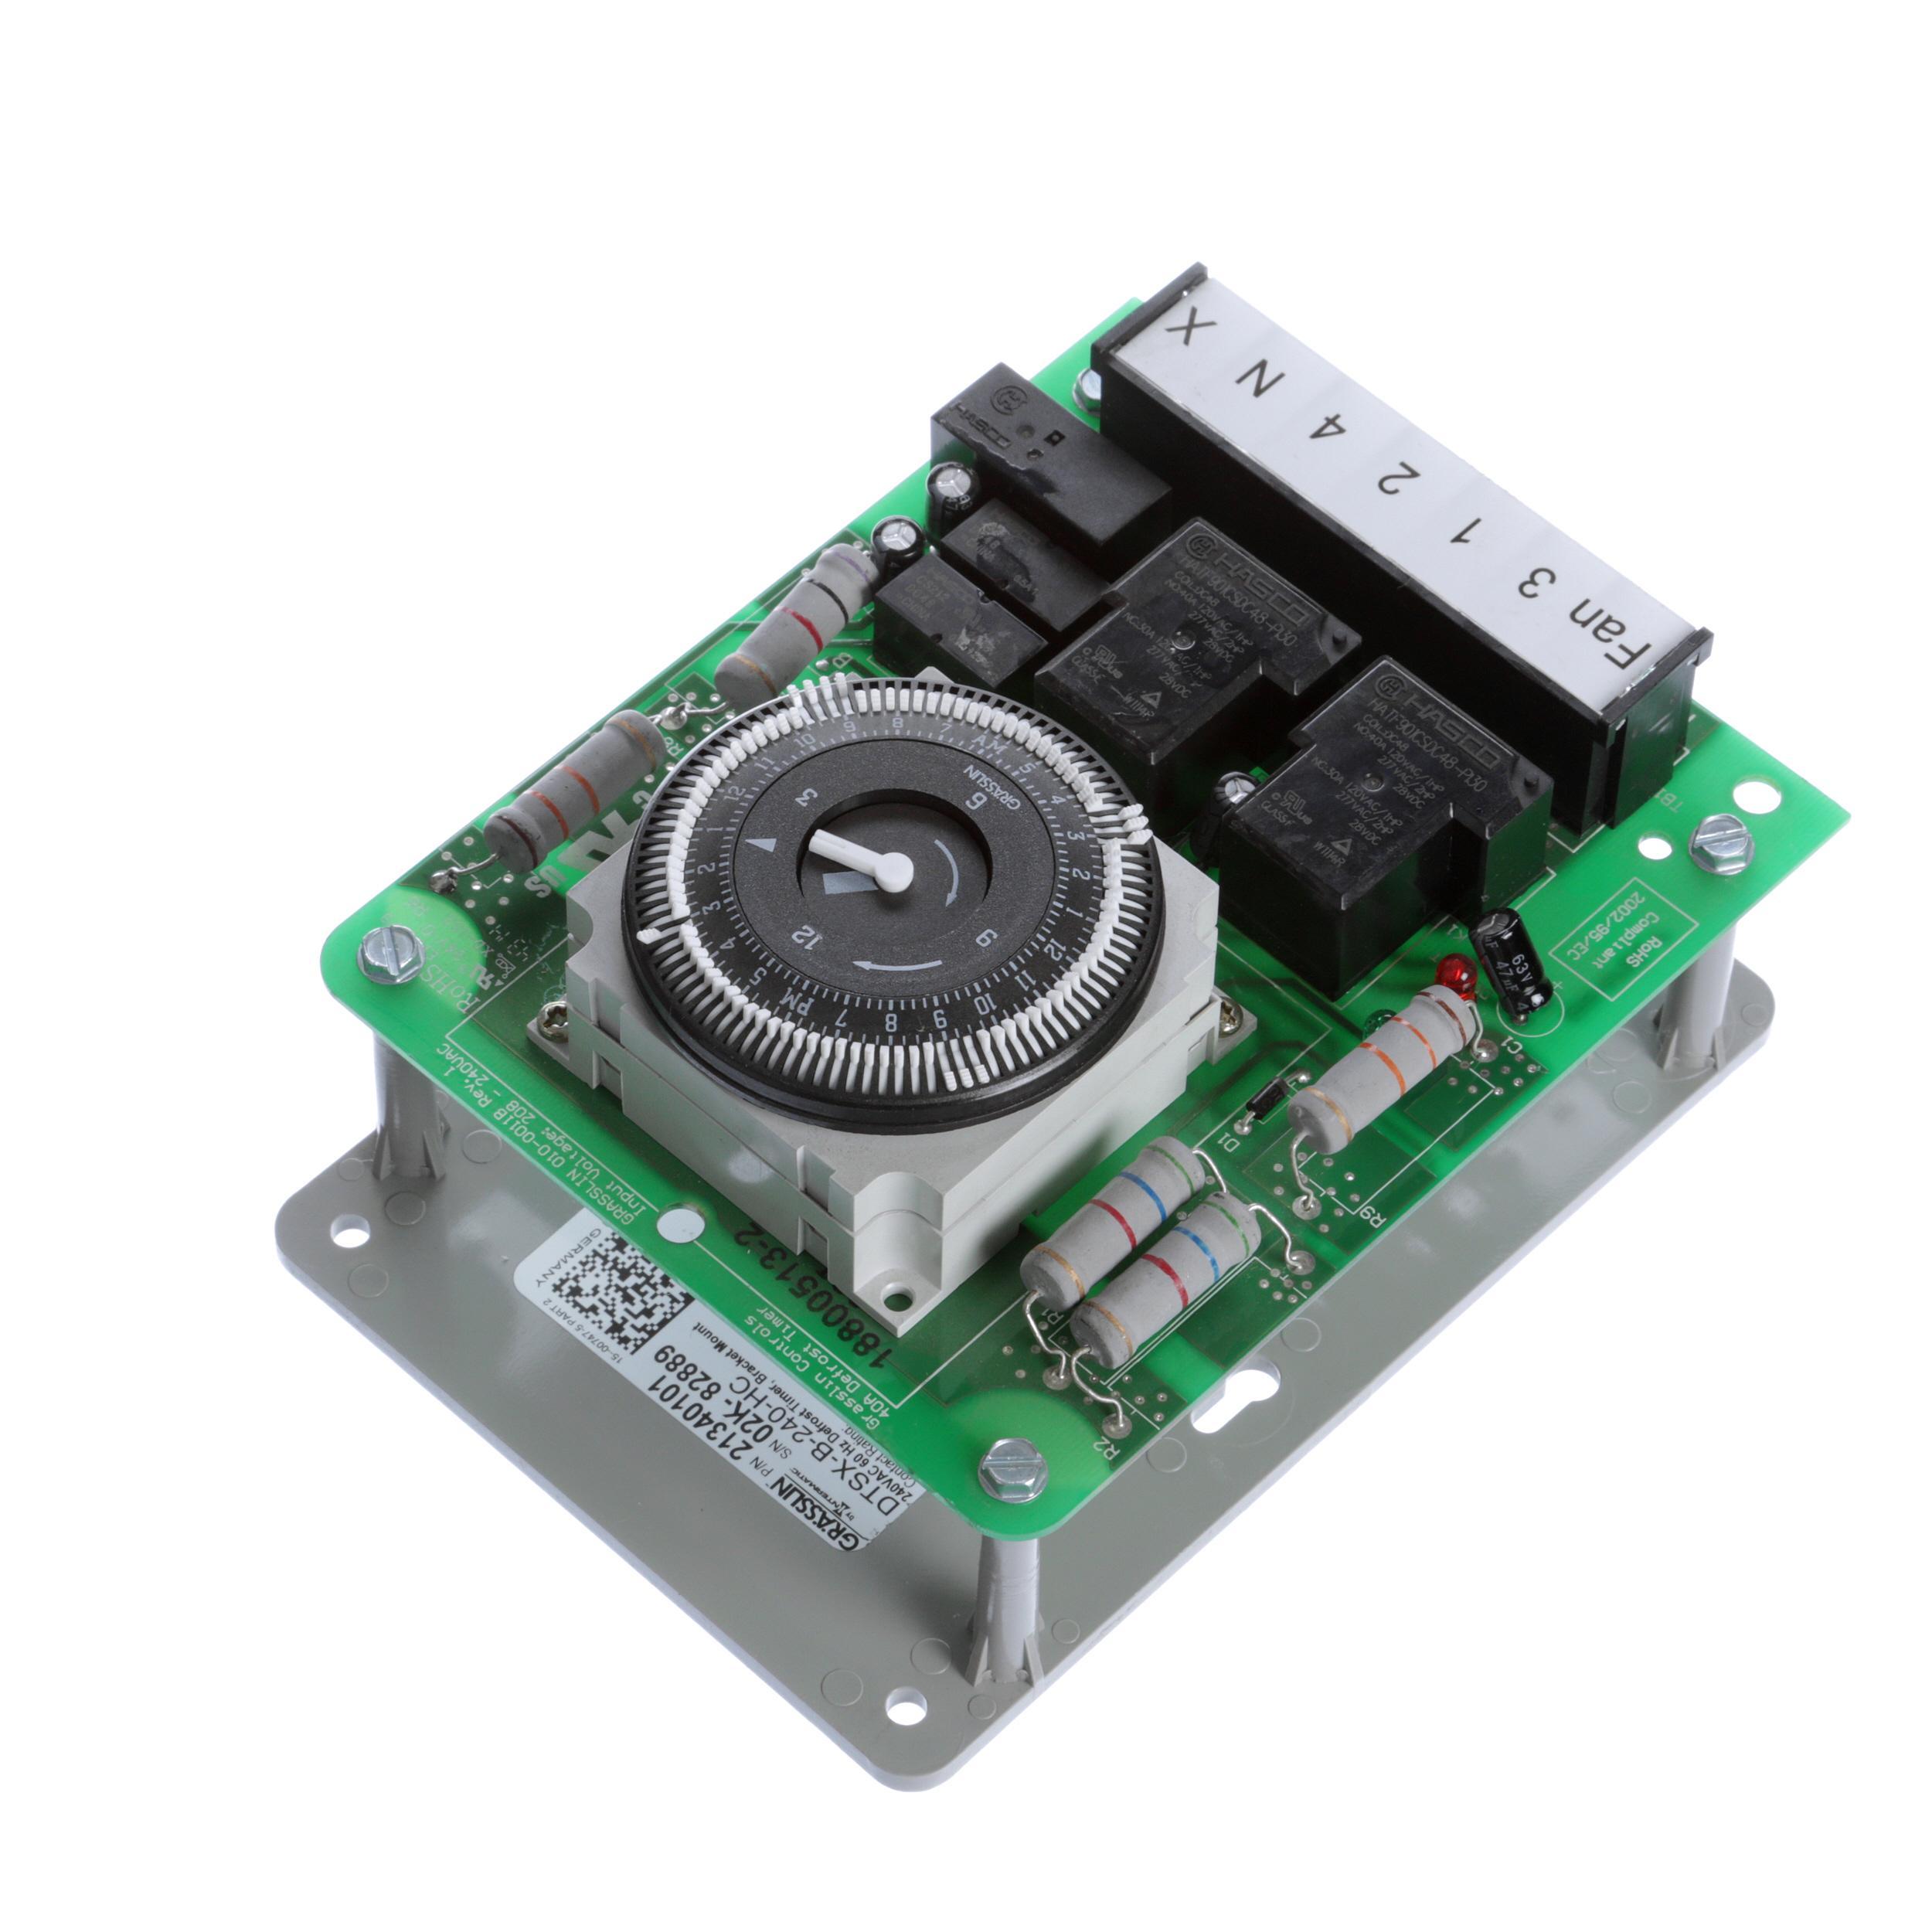 hight resolution of heatcraft defrost timer 40 amp 230v 60hz dtsx240 part 21340101 rh heritageparts com 21340101 timer wiring diagram